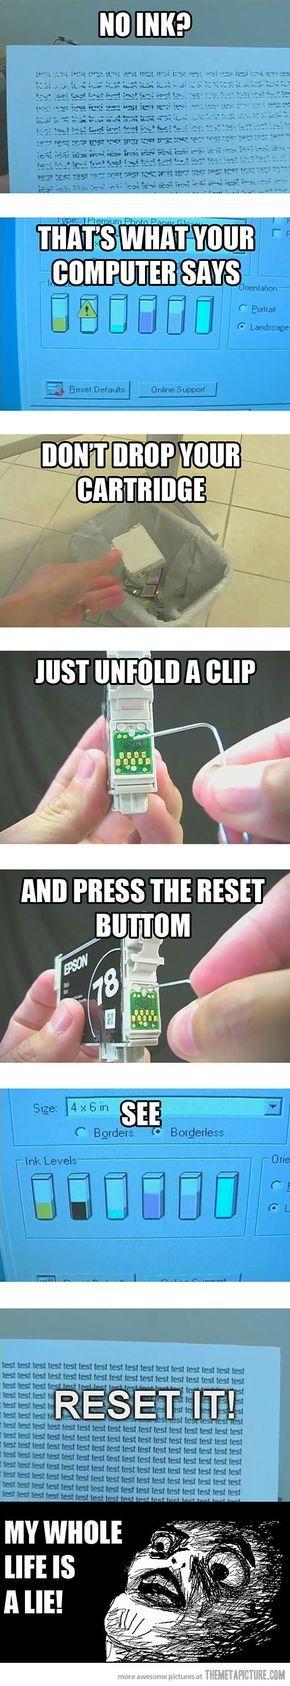 reset ink cartridges?